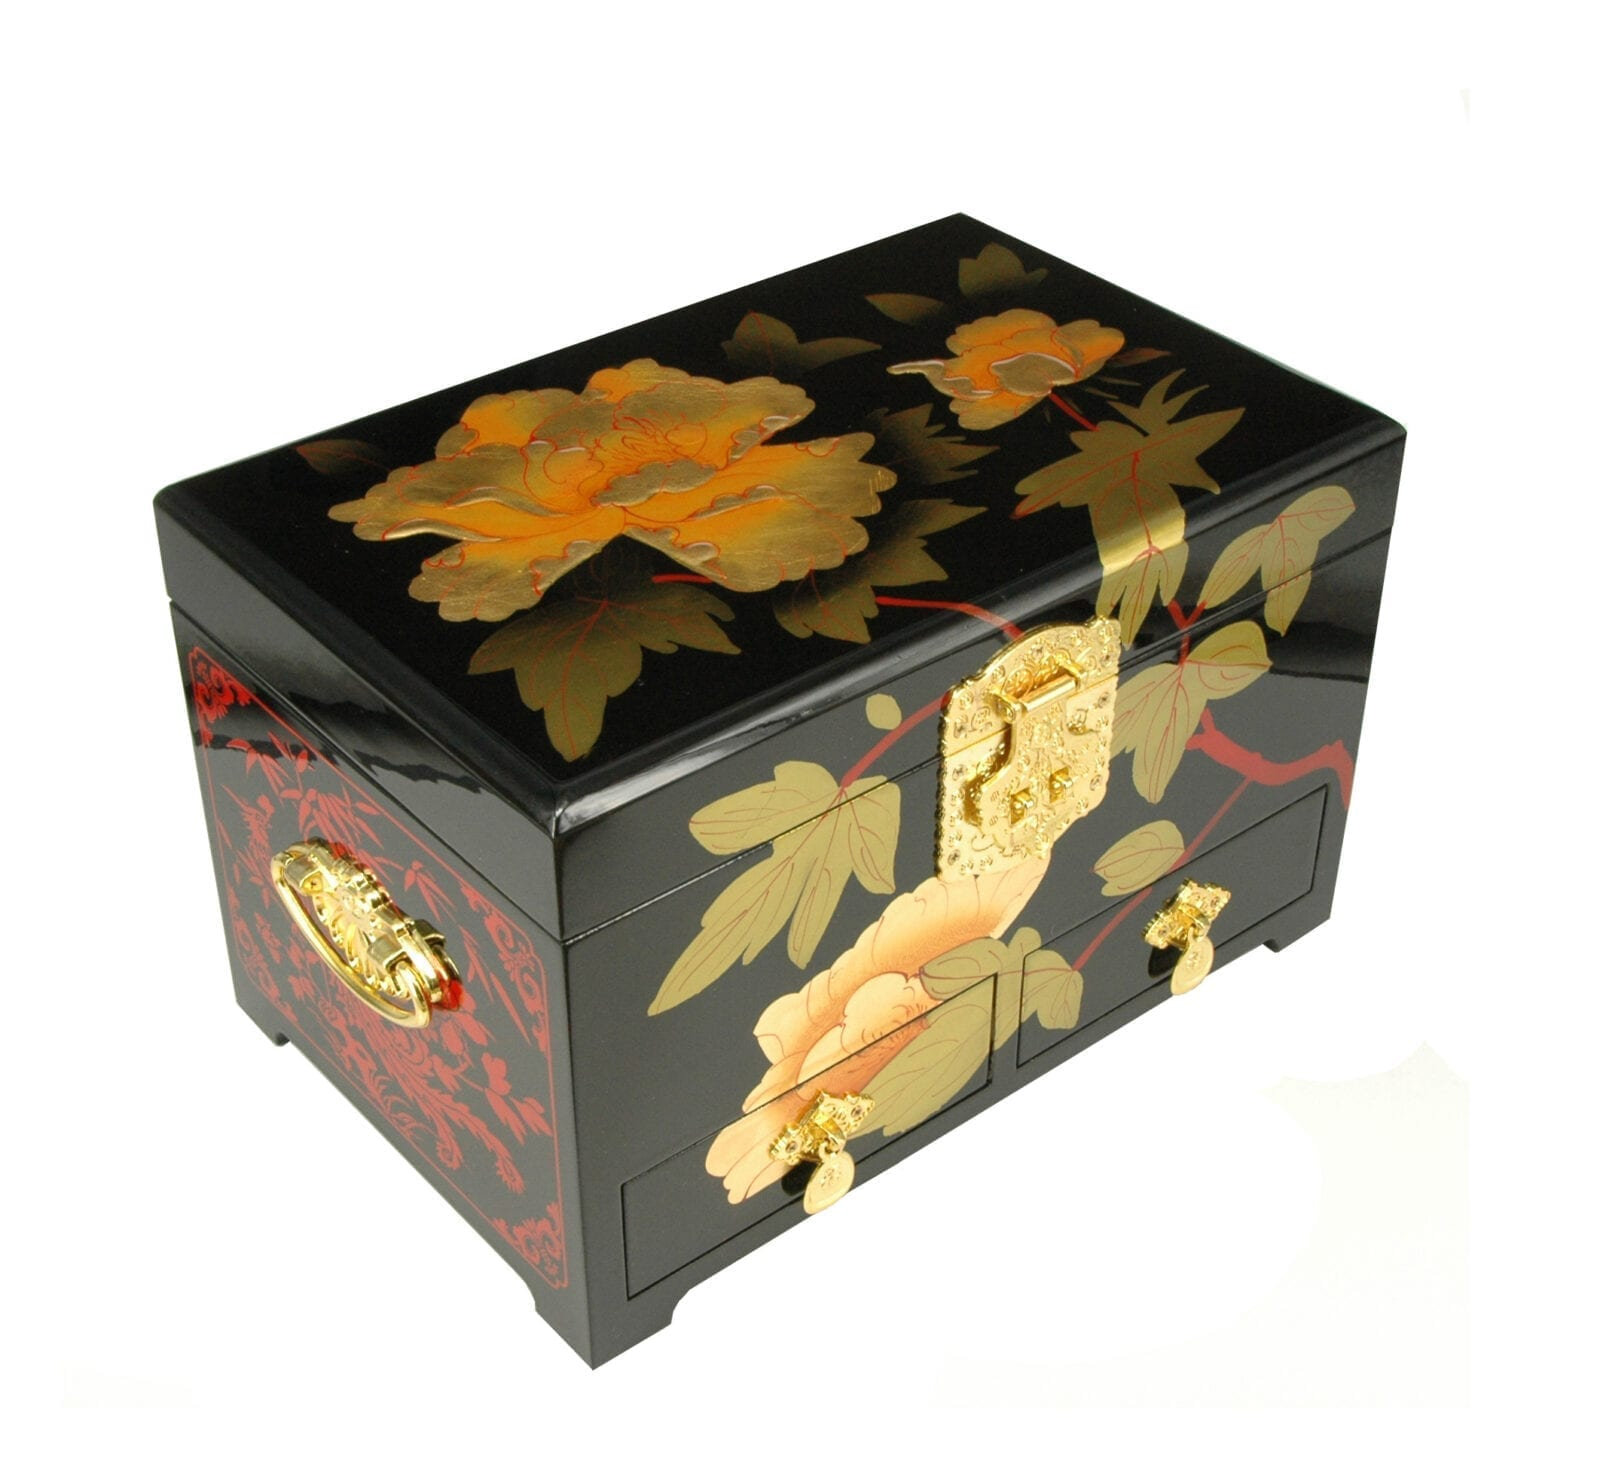 Chinese Juwelenkist Rose XL